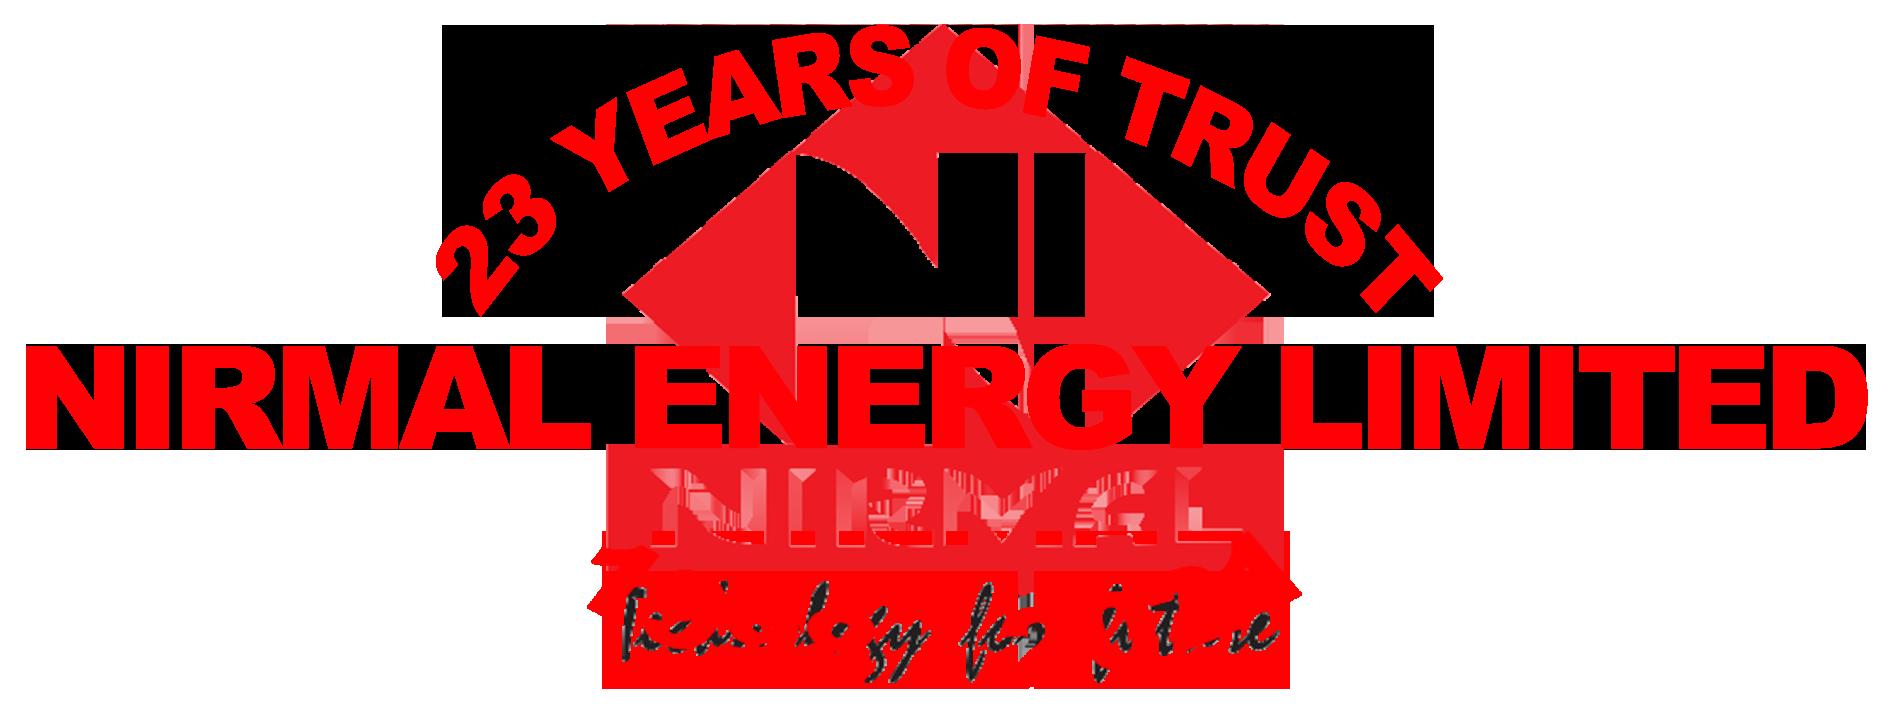 NEL logo 23 year